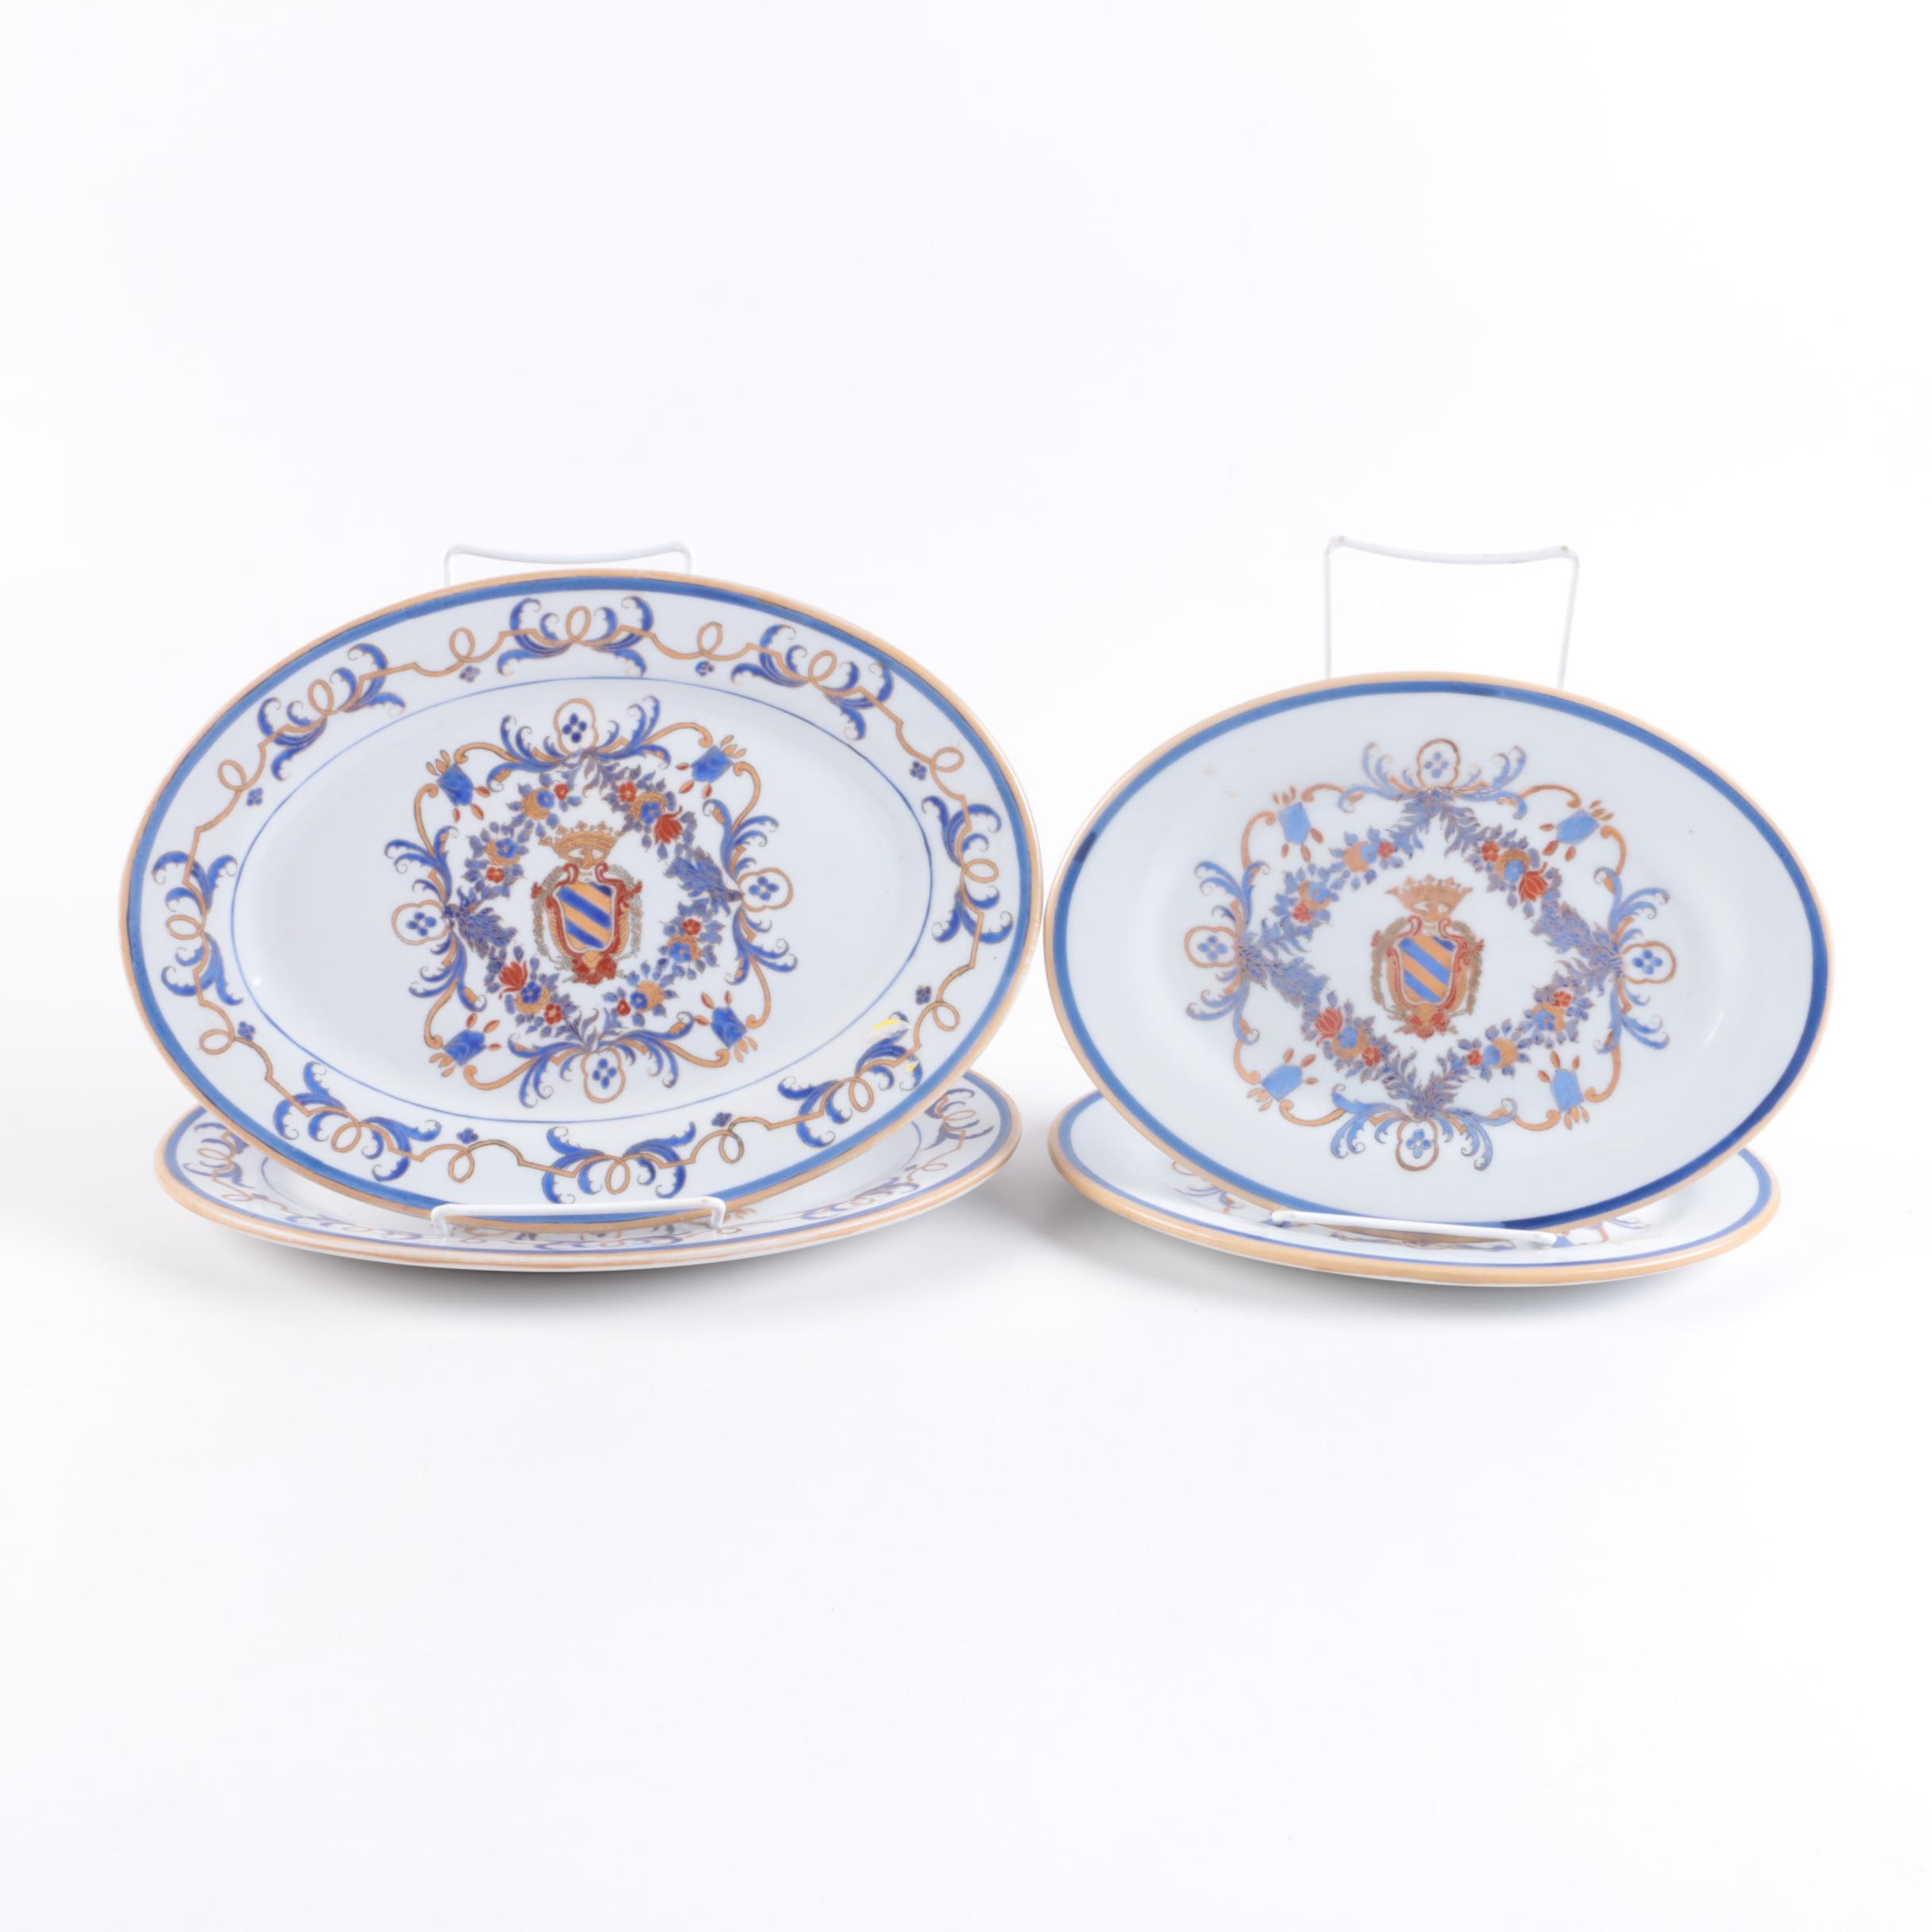 Vintage Armorial Decorated Porcelain